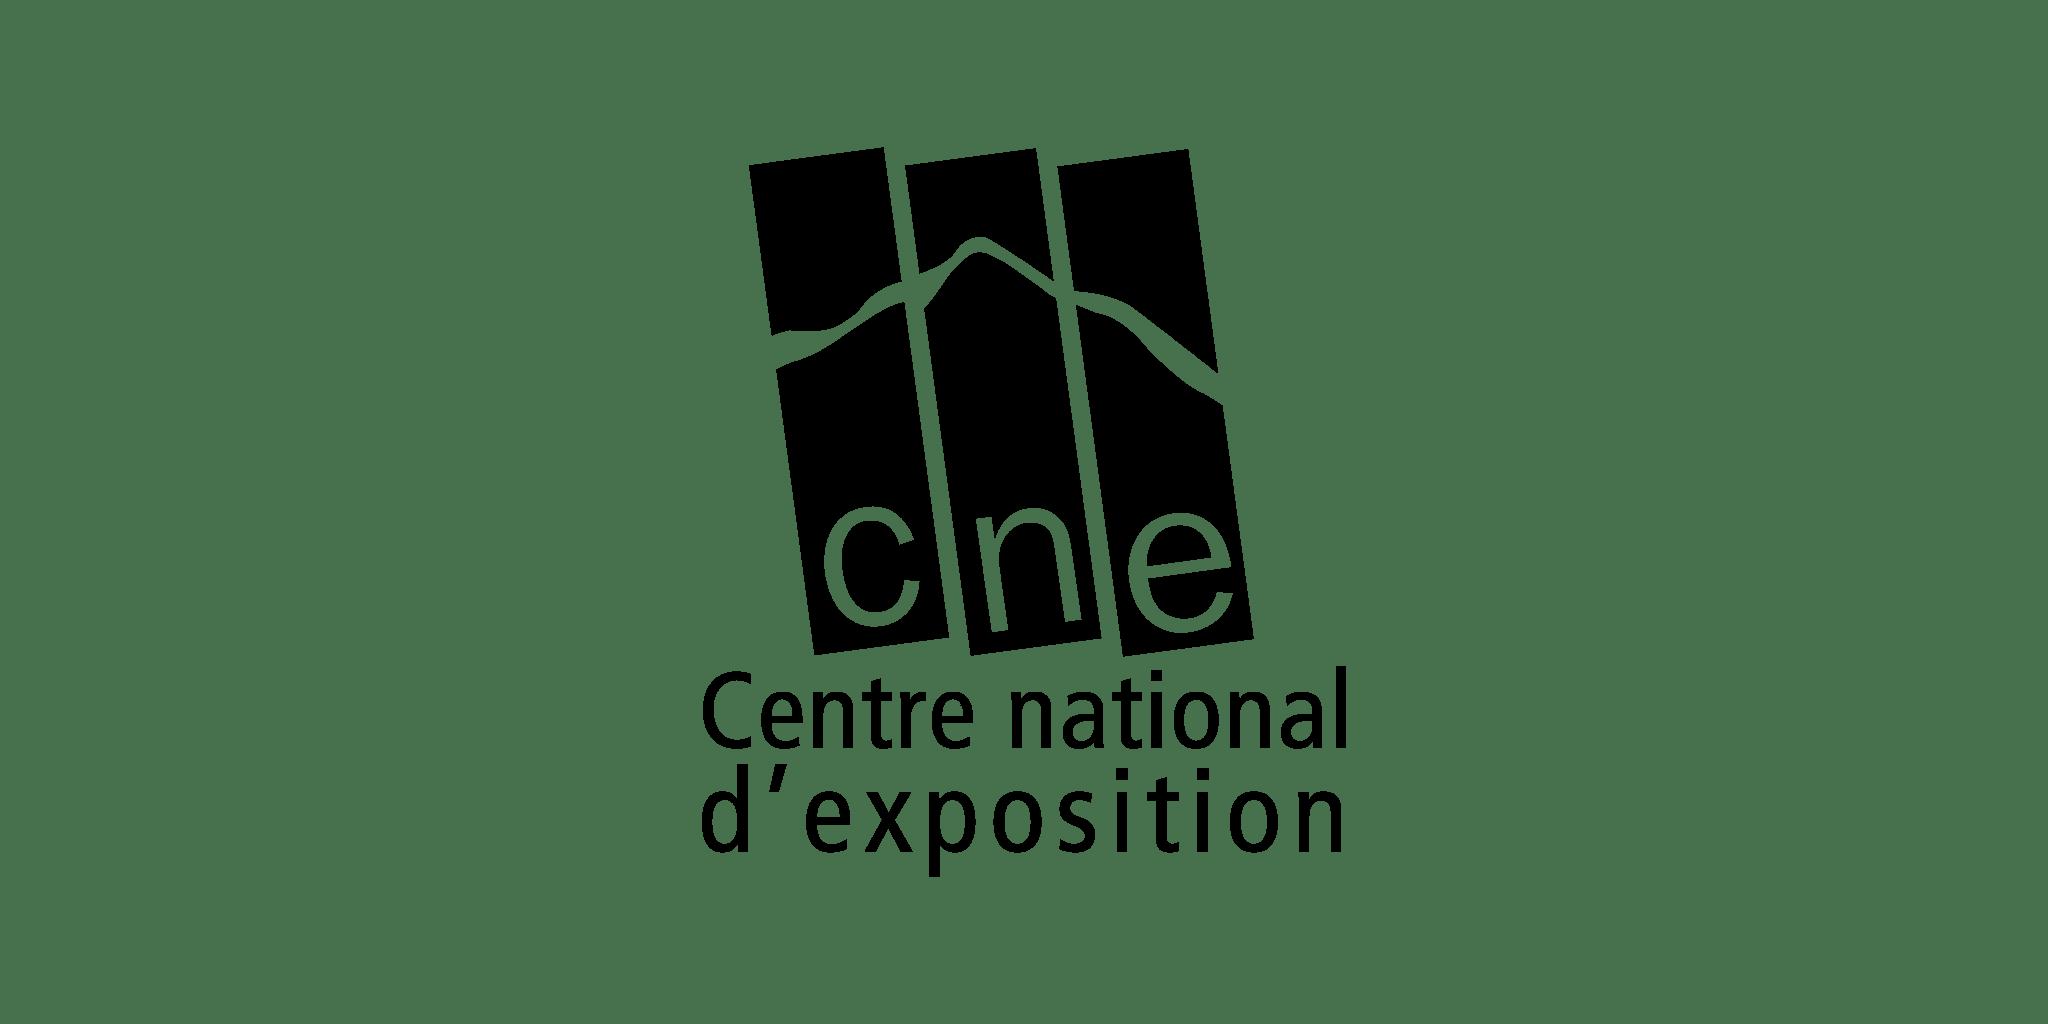 Centre national d'exposition